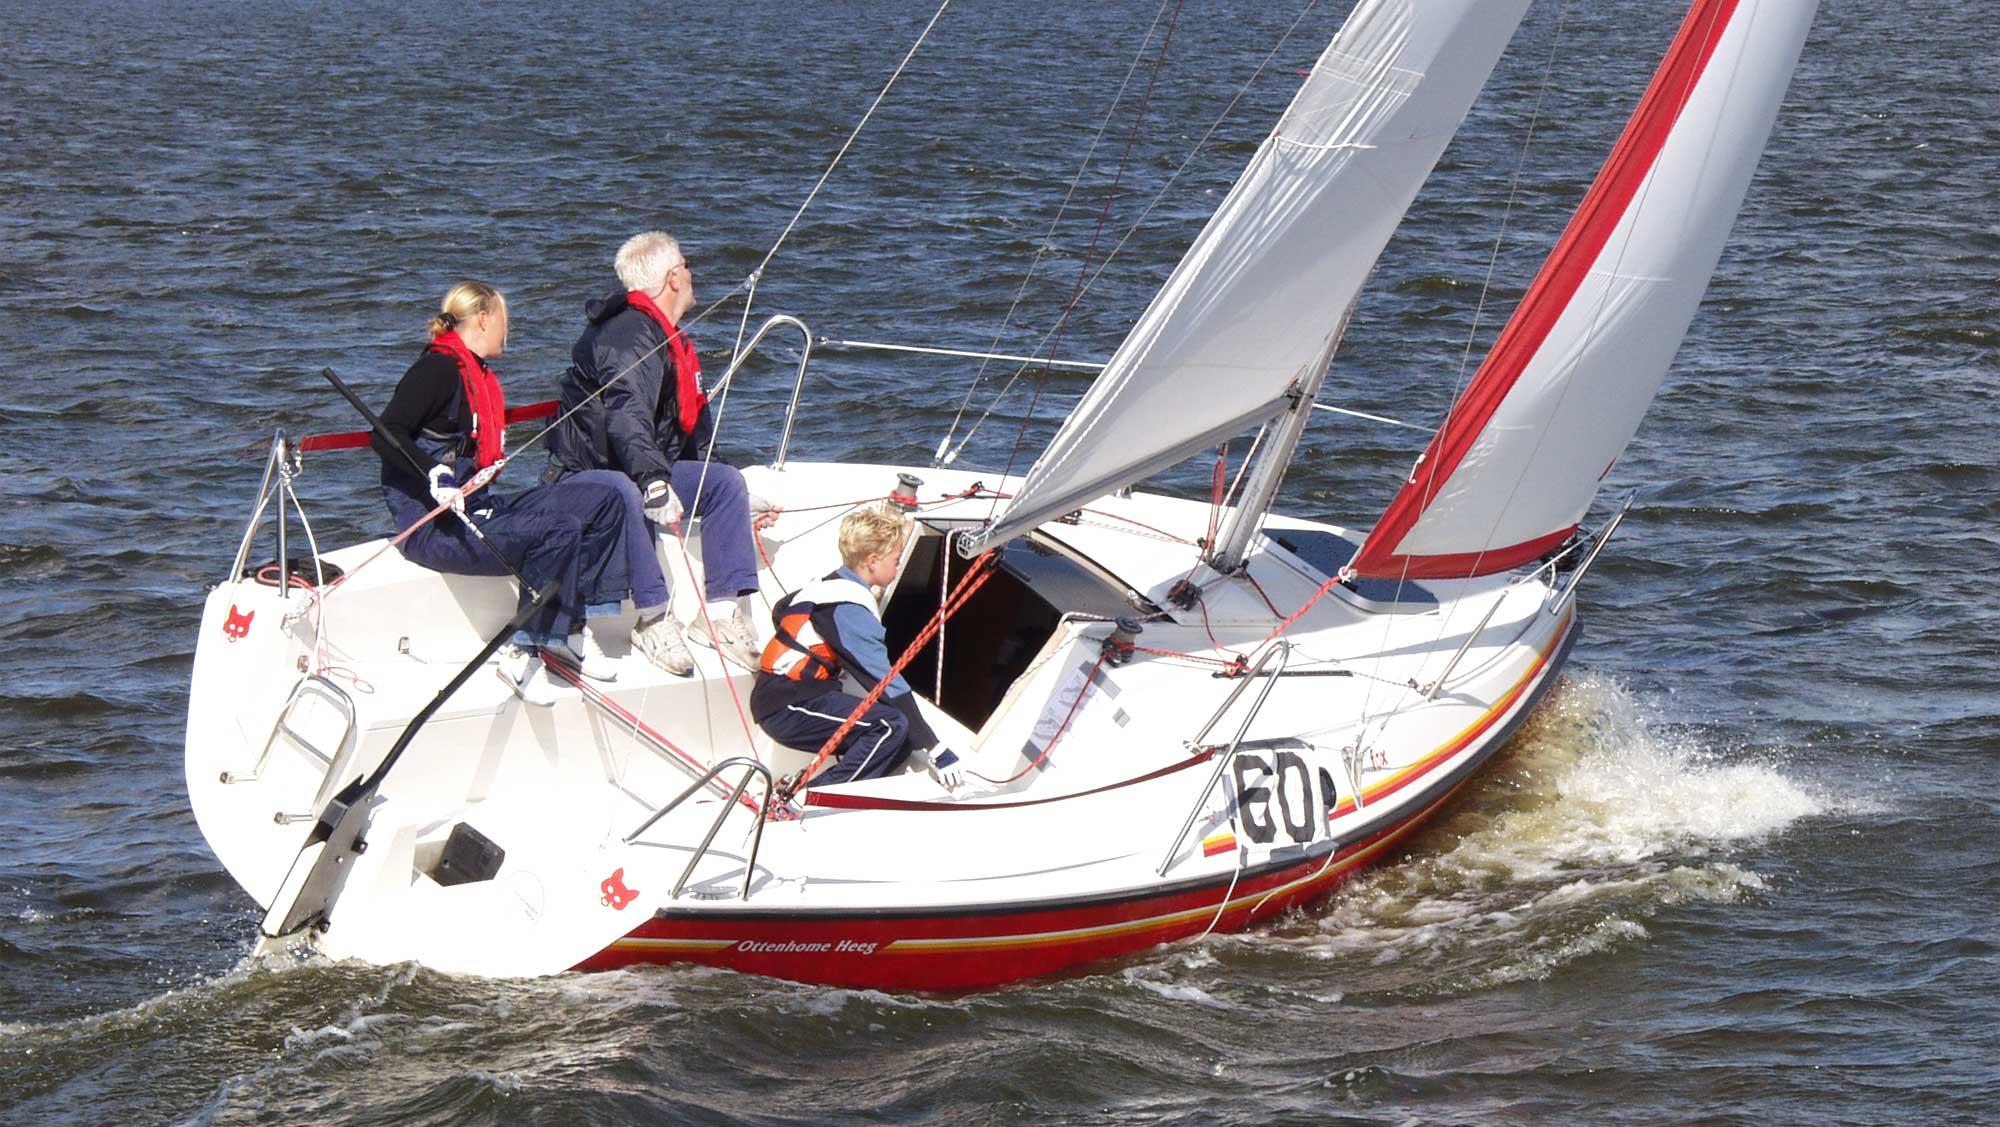 Zeilschool De Randmeren Molecaten Park Flevostrand 11 zeilles bootverhuur Fox